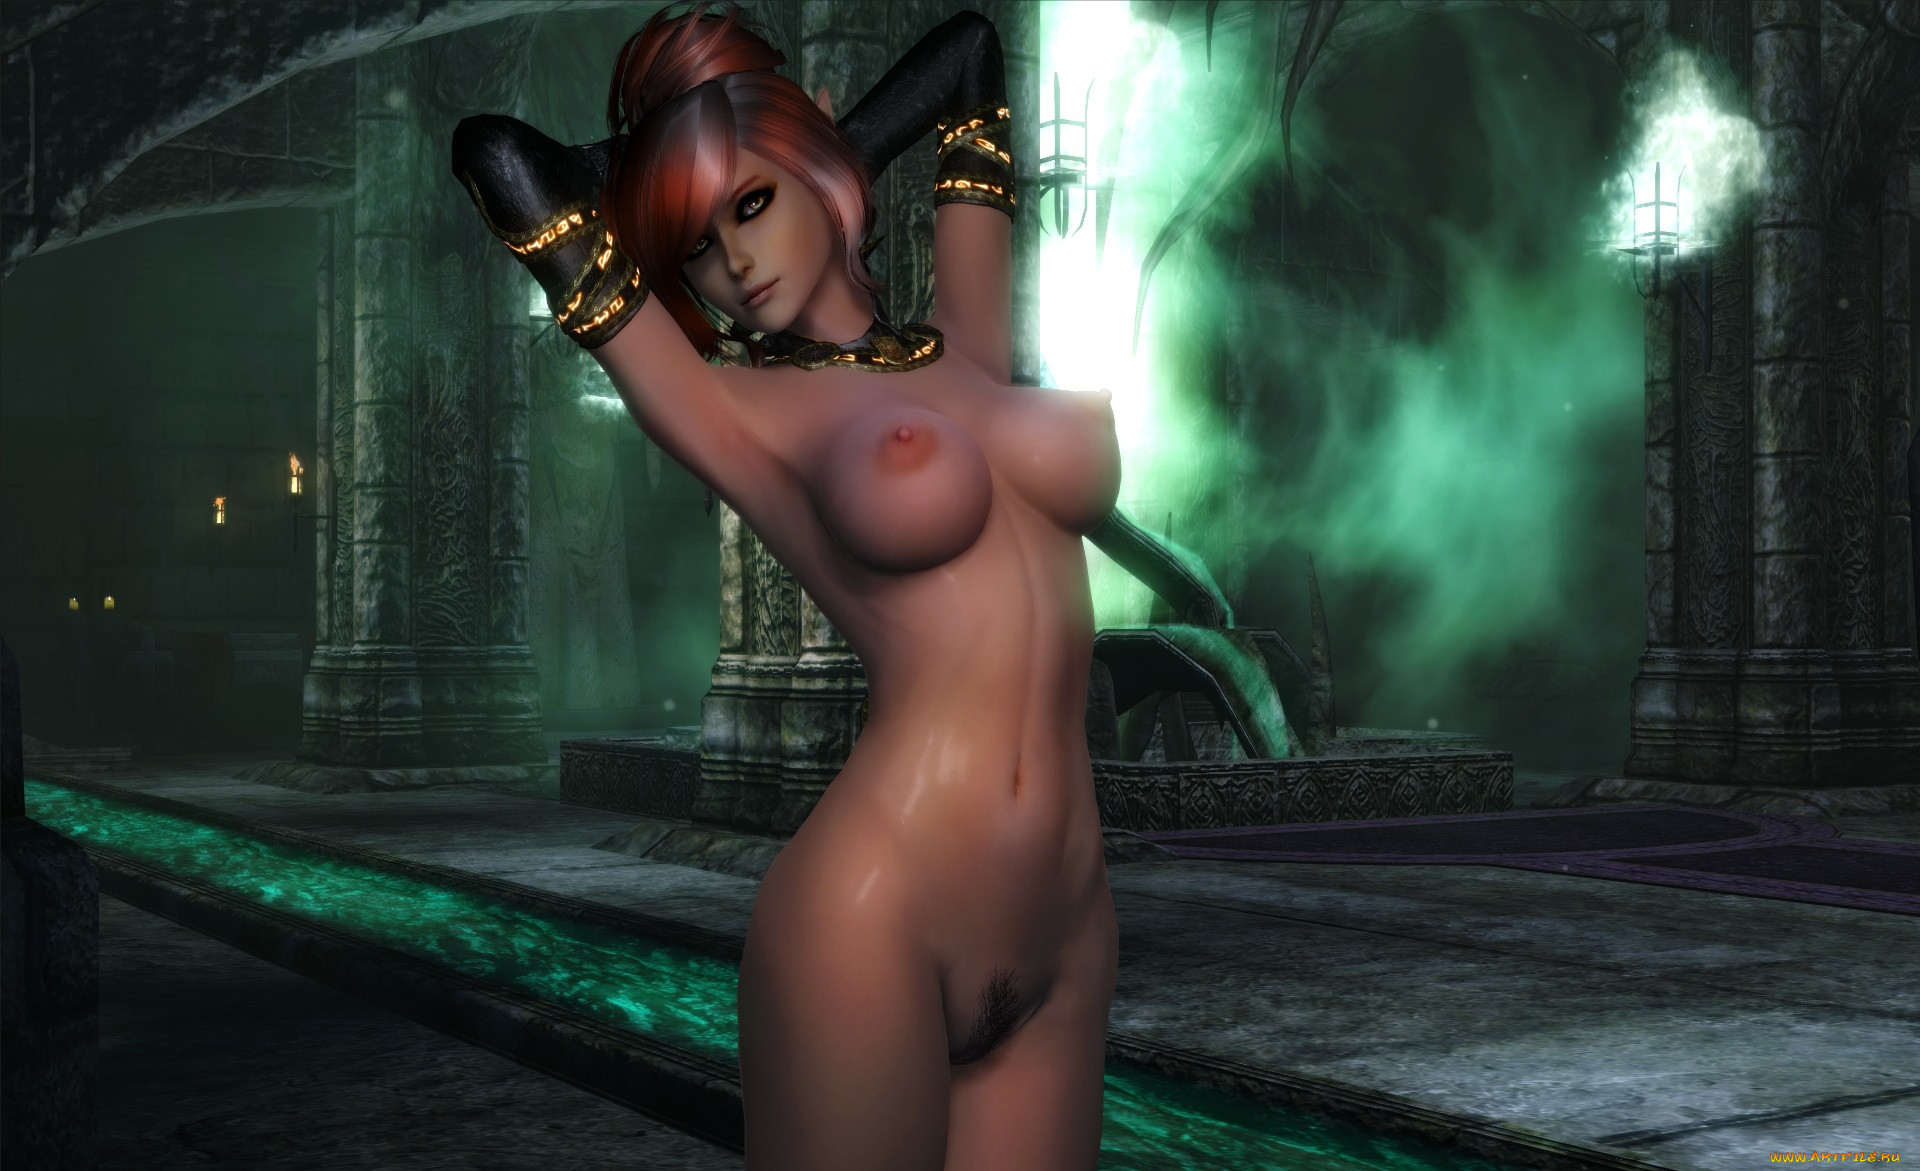 Free skyrim nude mods pics softcore clips